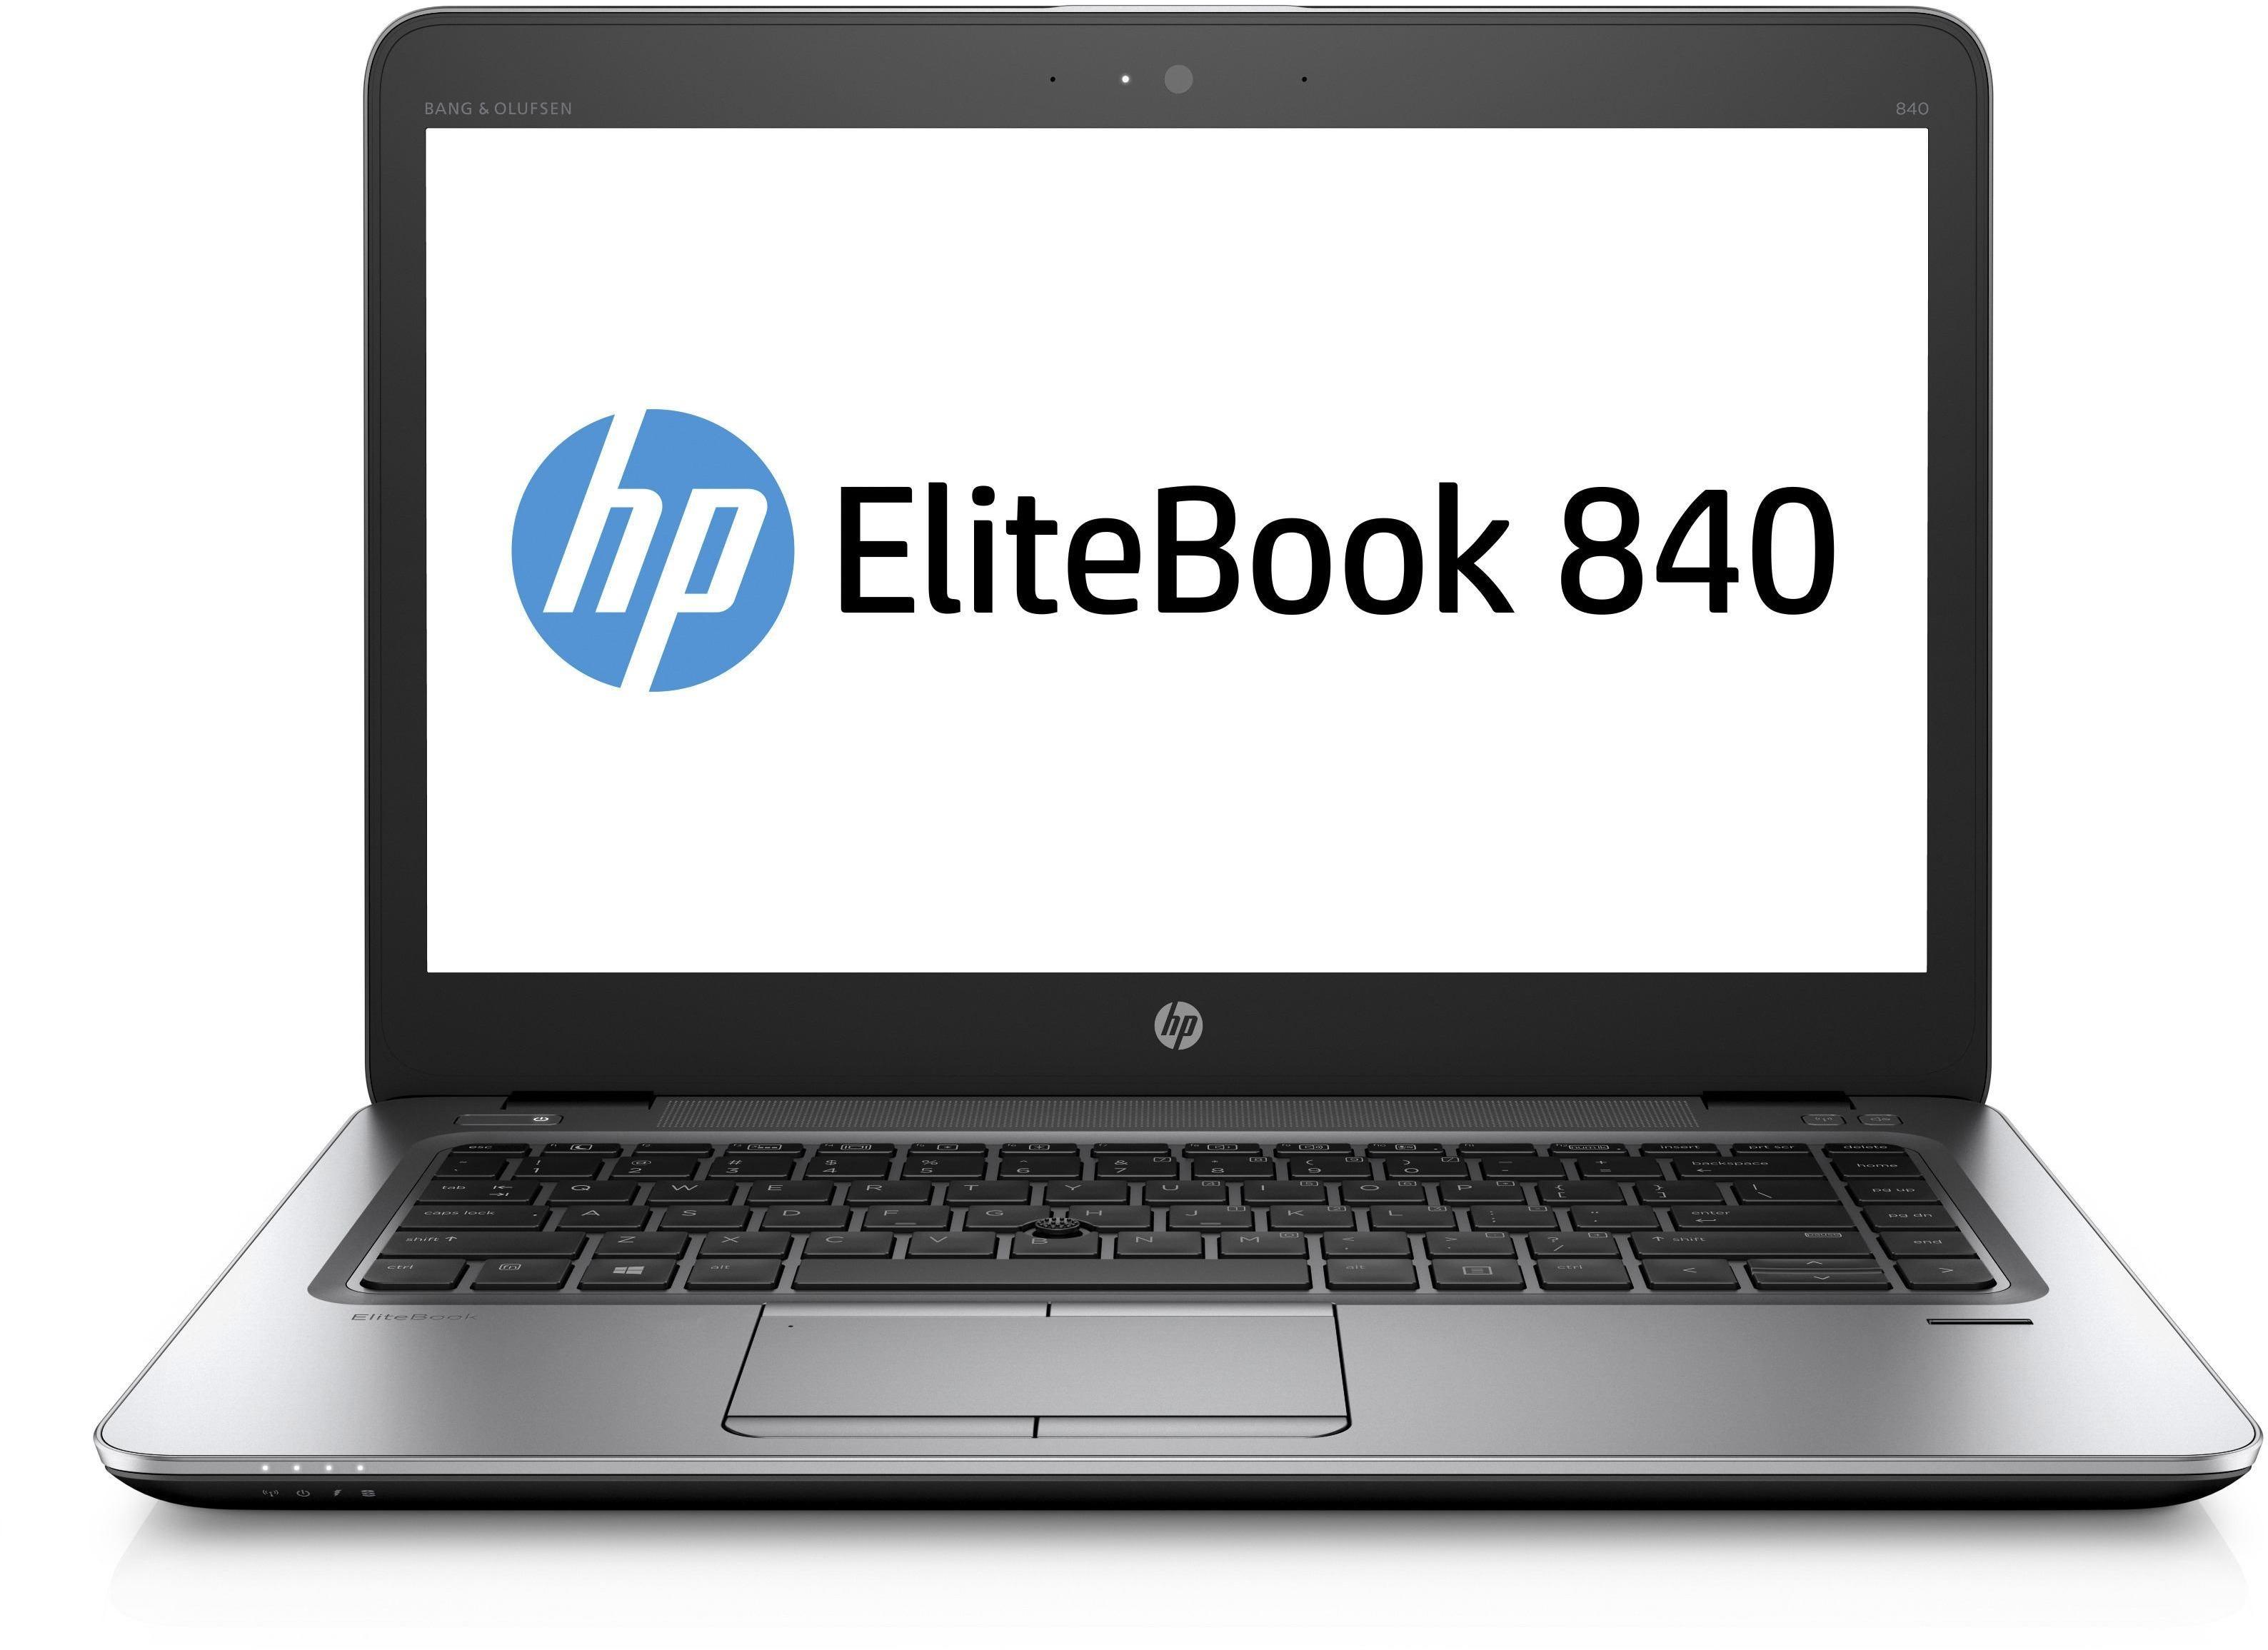 HP EliteBook 840 G3 - afbeelding 2